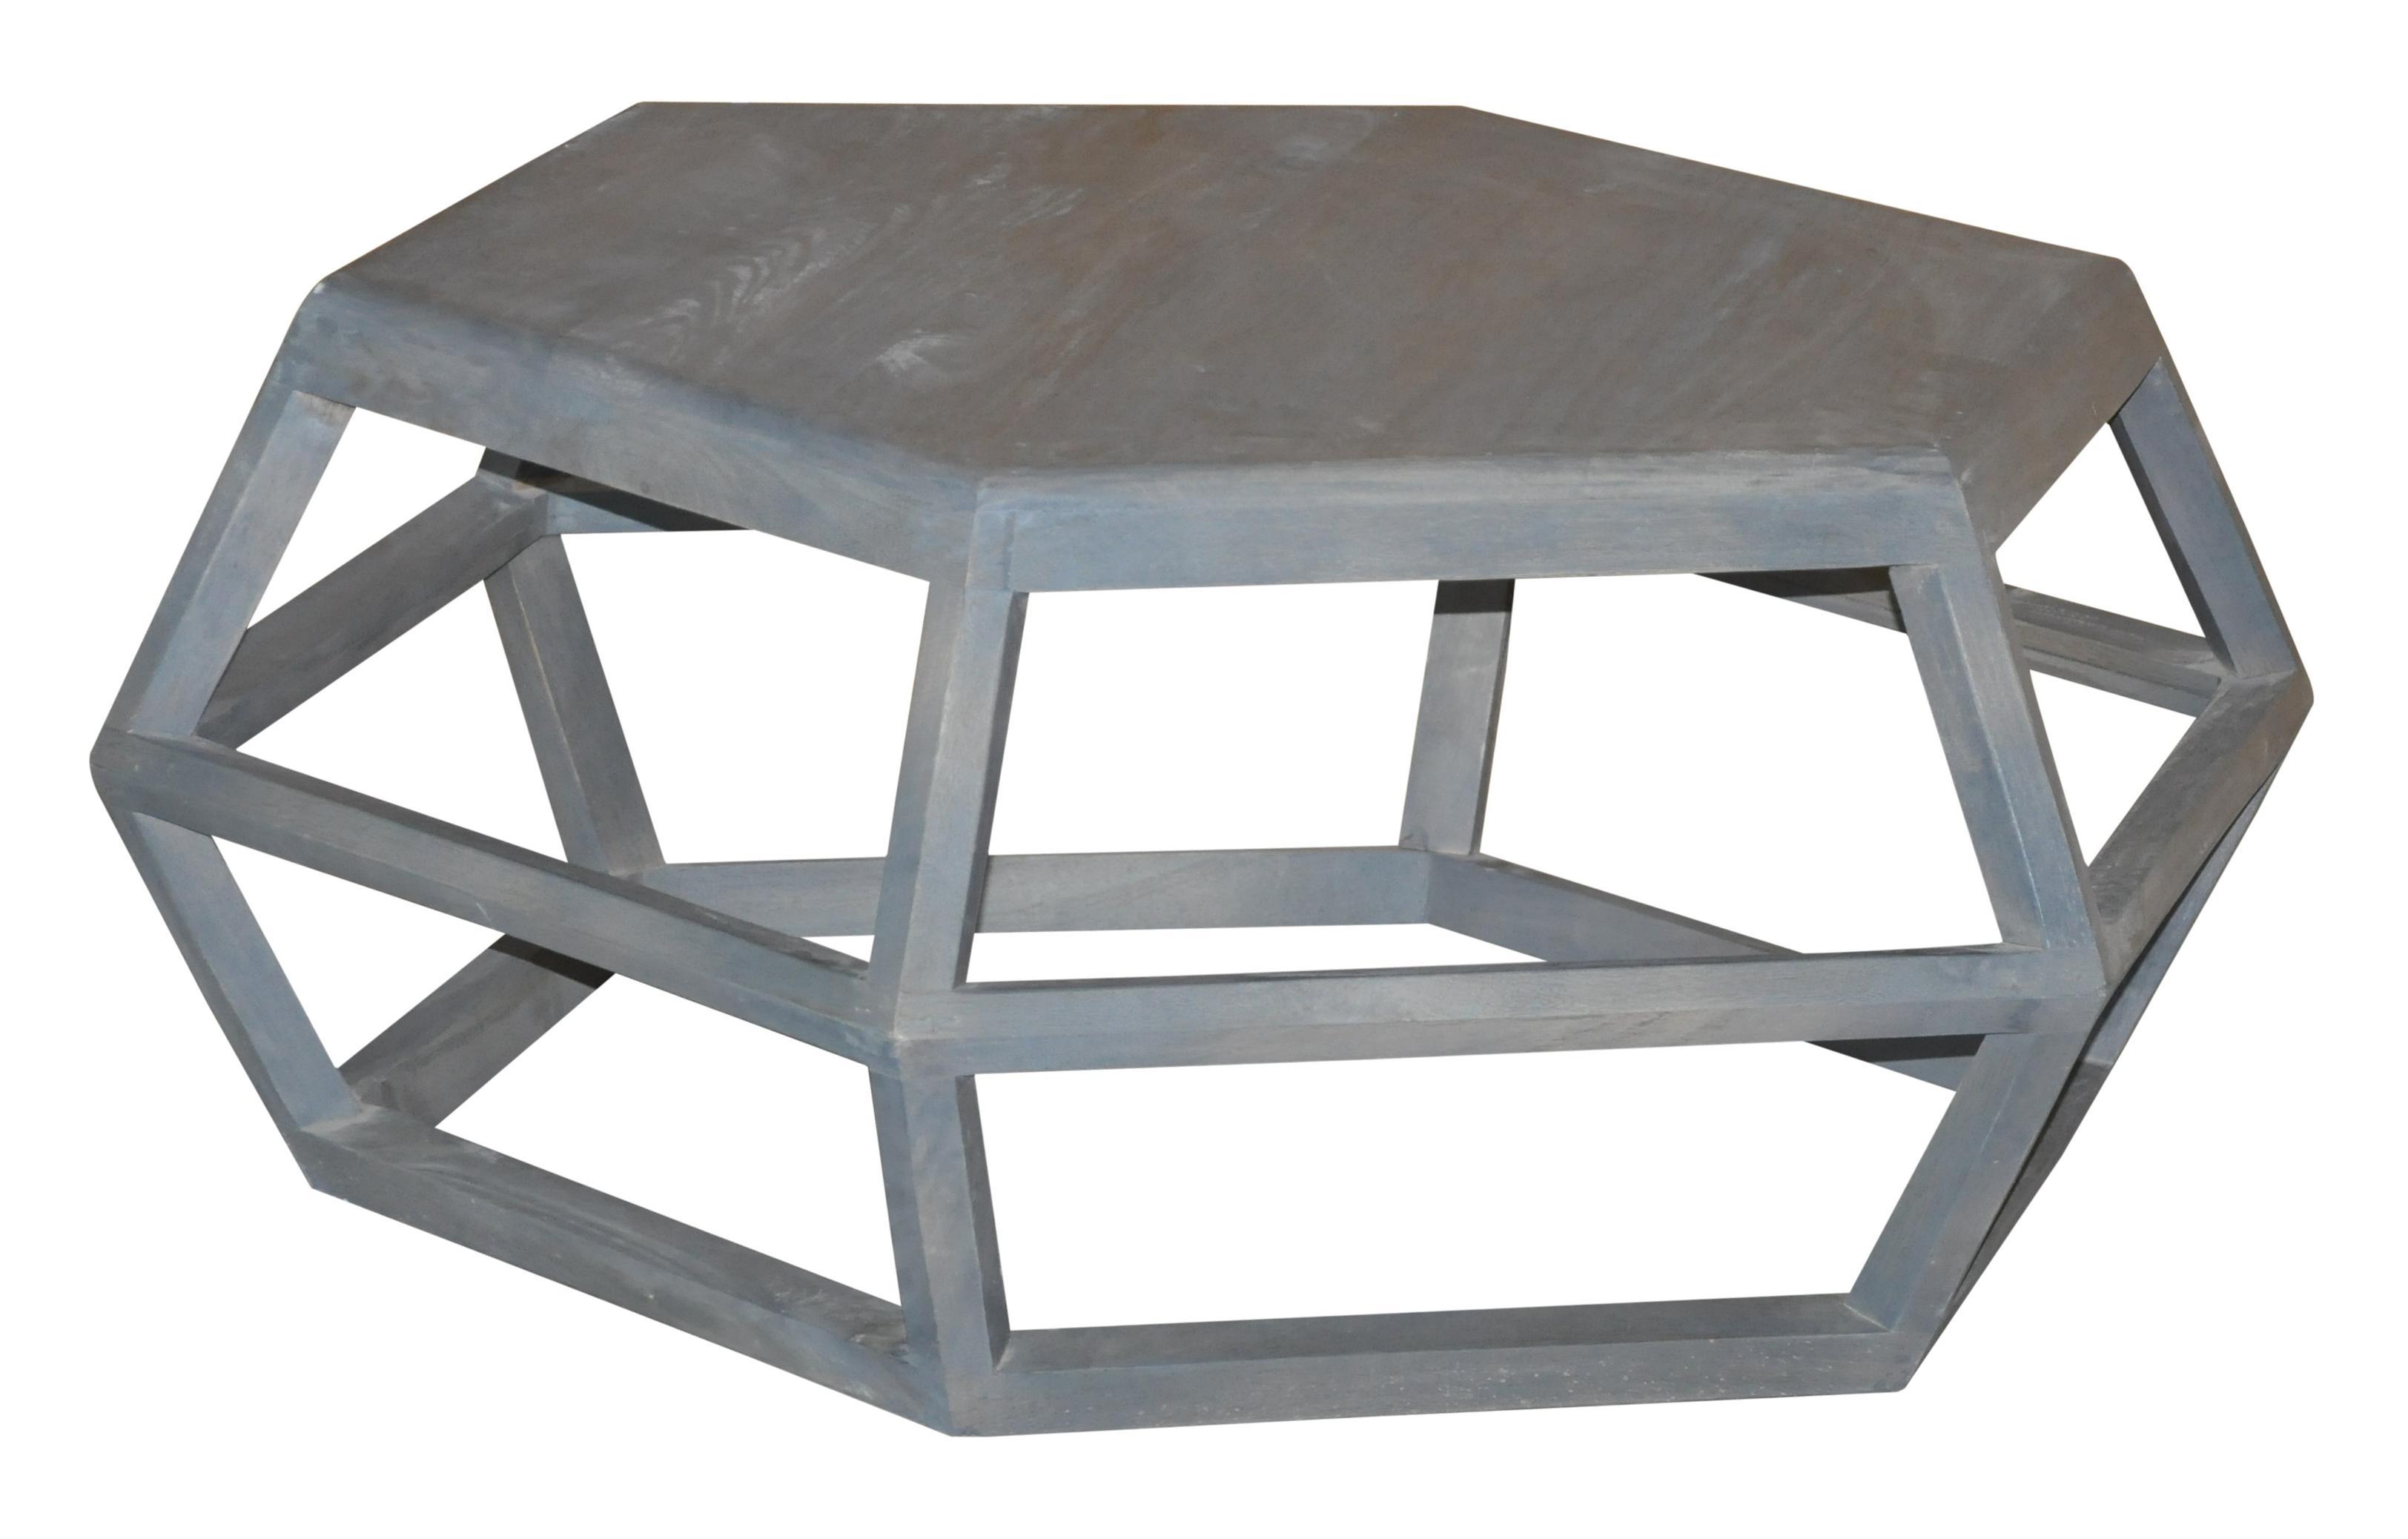 Jaipur furniture neemrana geometric coffee table with modern industrial style